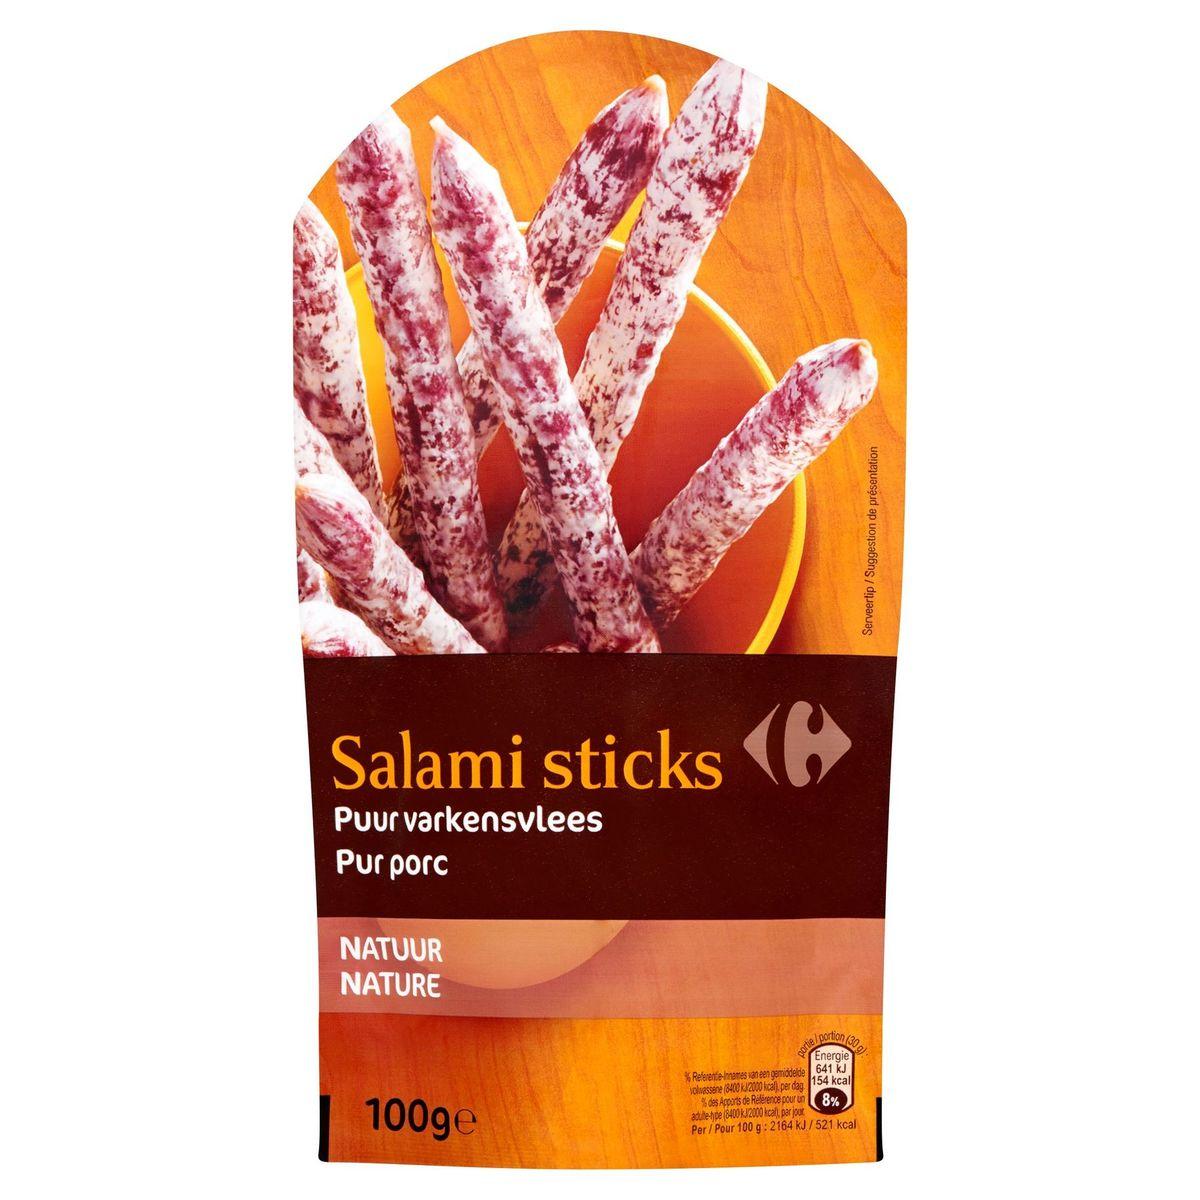 Carrefour Salami Sticks Puur Varkensvlees Natuur 100 g